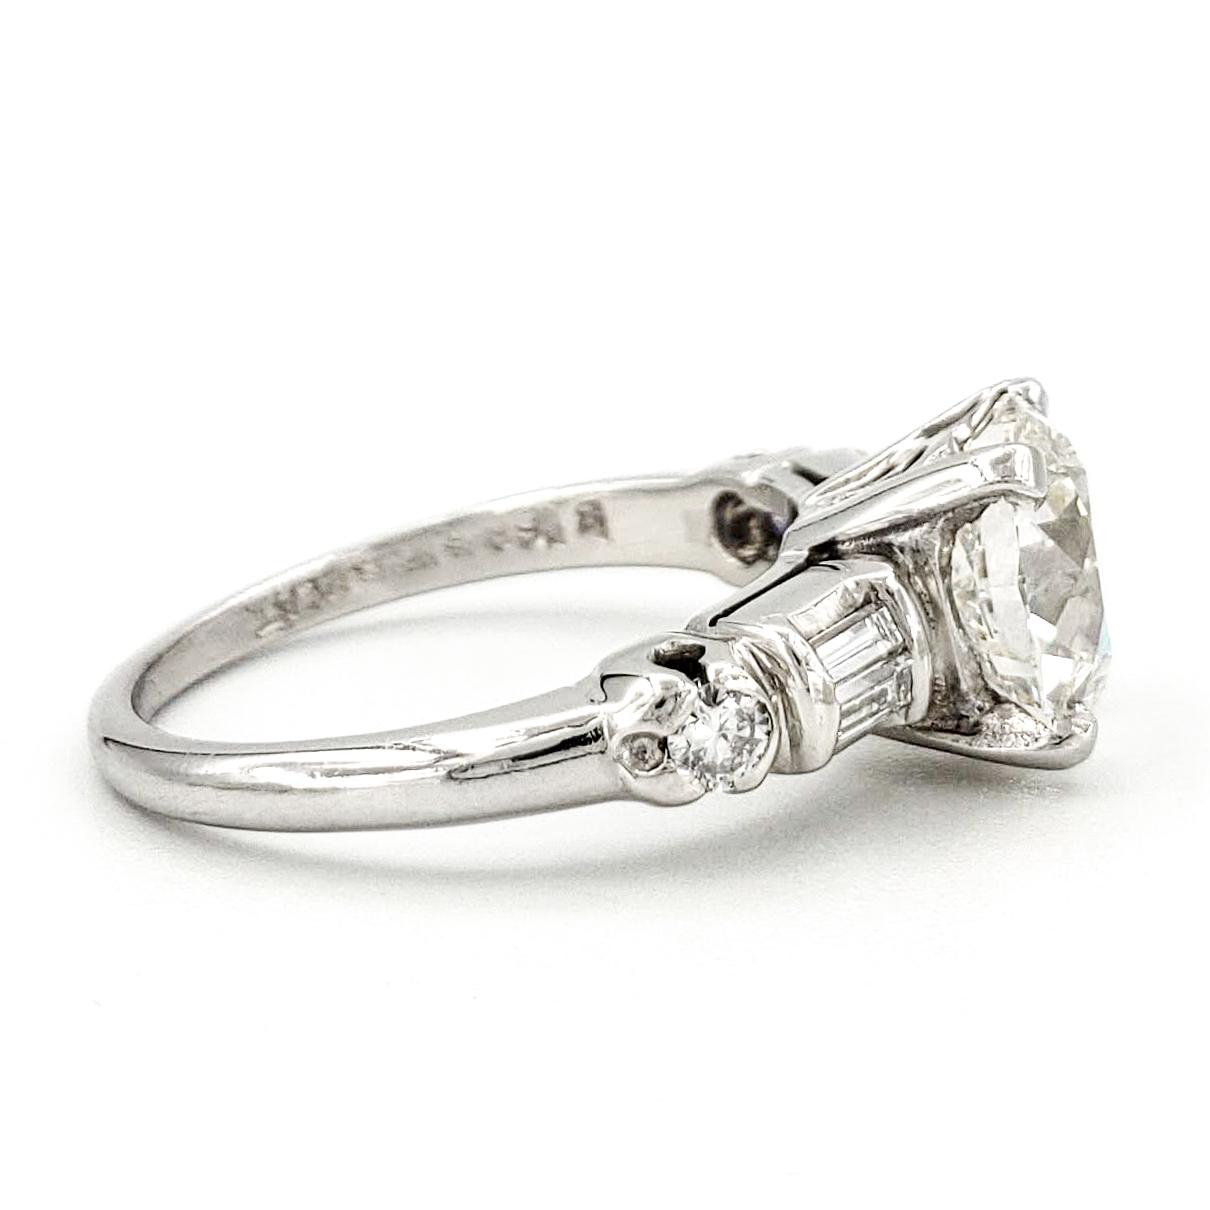 vintage-platinum-engagement-ring-with-1-72-carat-old-european-cut-diamond-egl-g-vs1